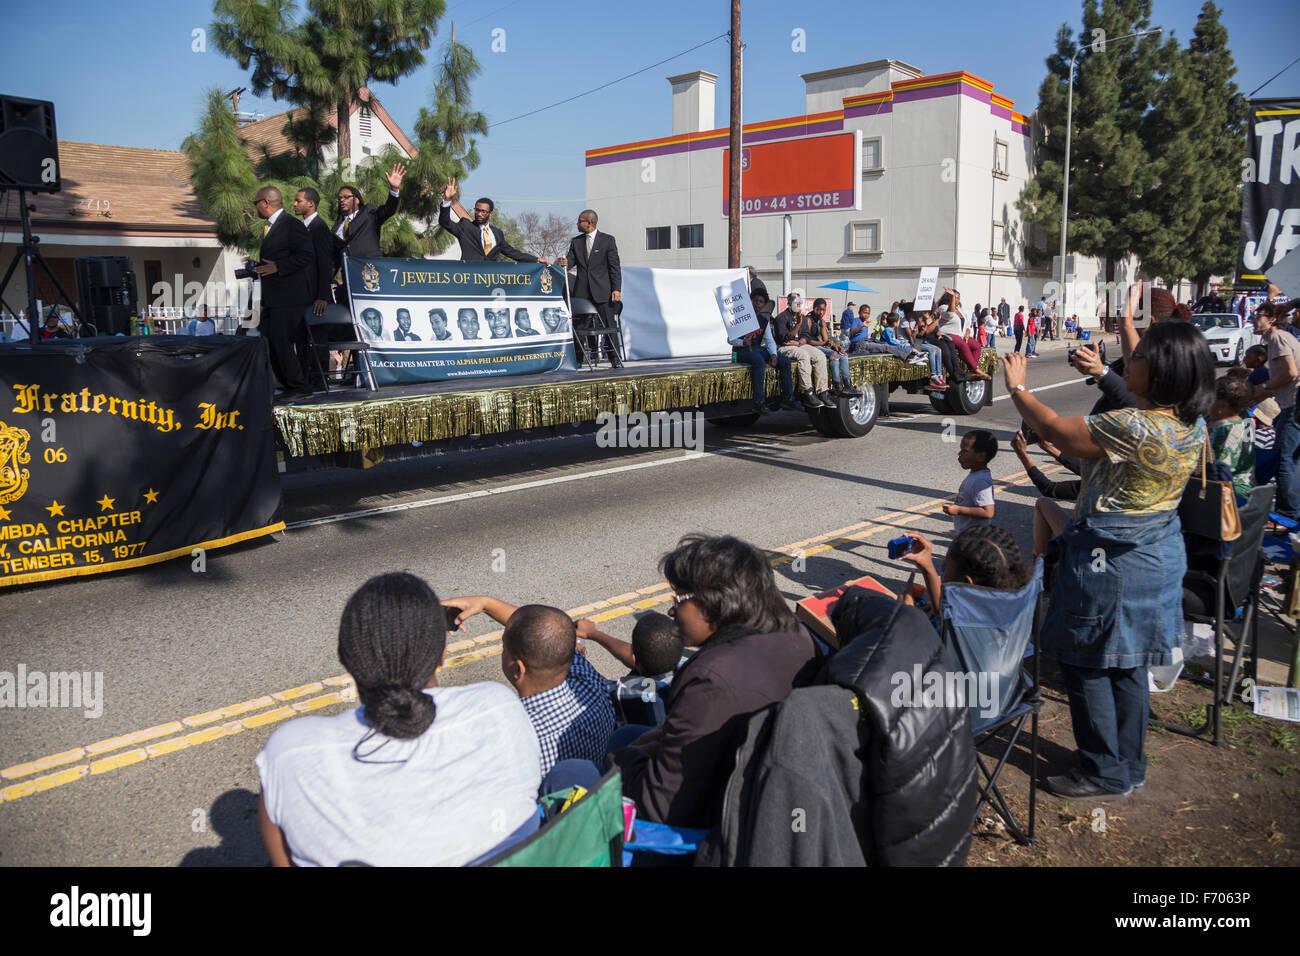 Los Angeles, California, USA, January 19, 2015, 30th annual Martin Luther King Jr. Kingdom Day Parade Stock Photo